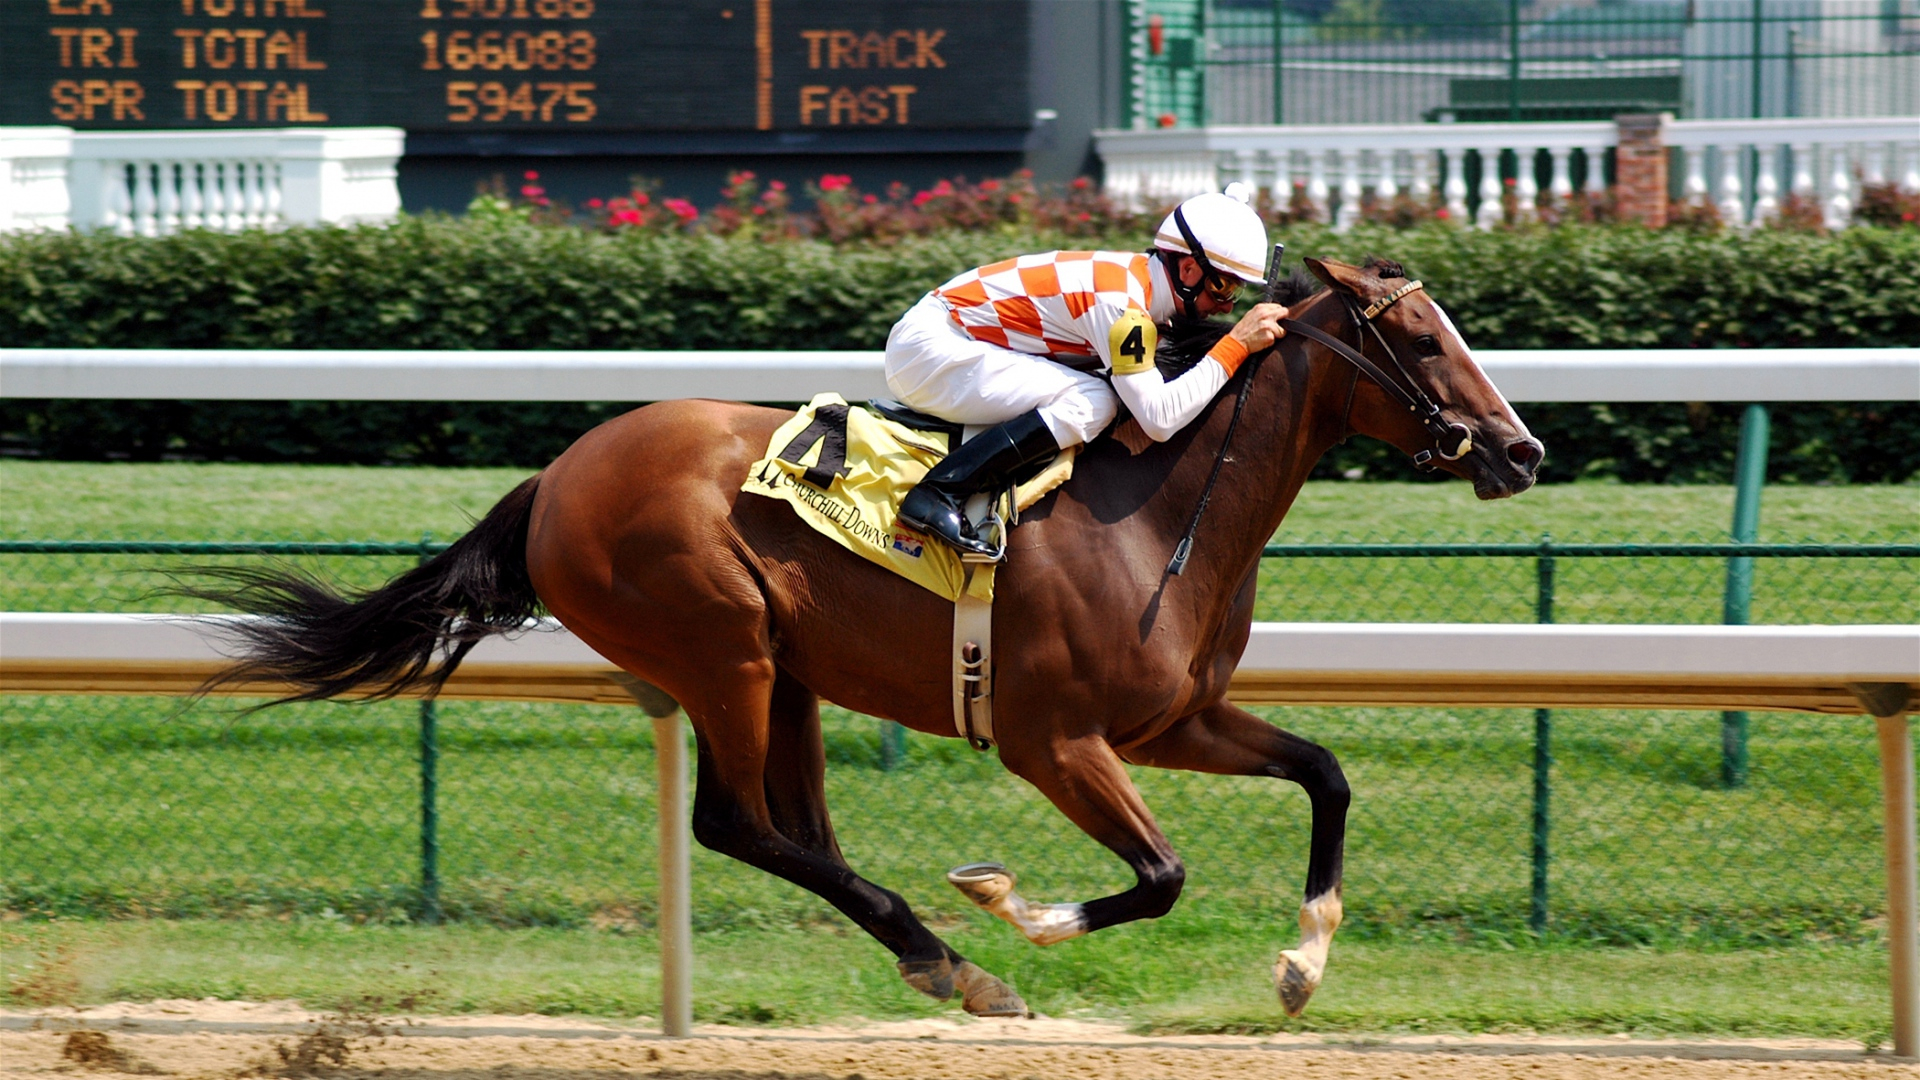 free Horse racing games